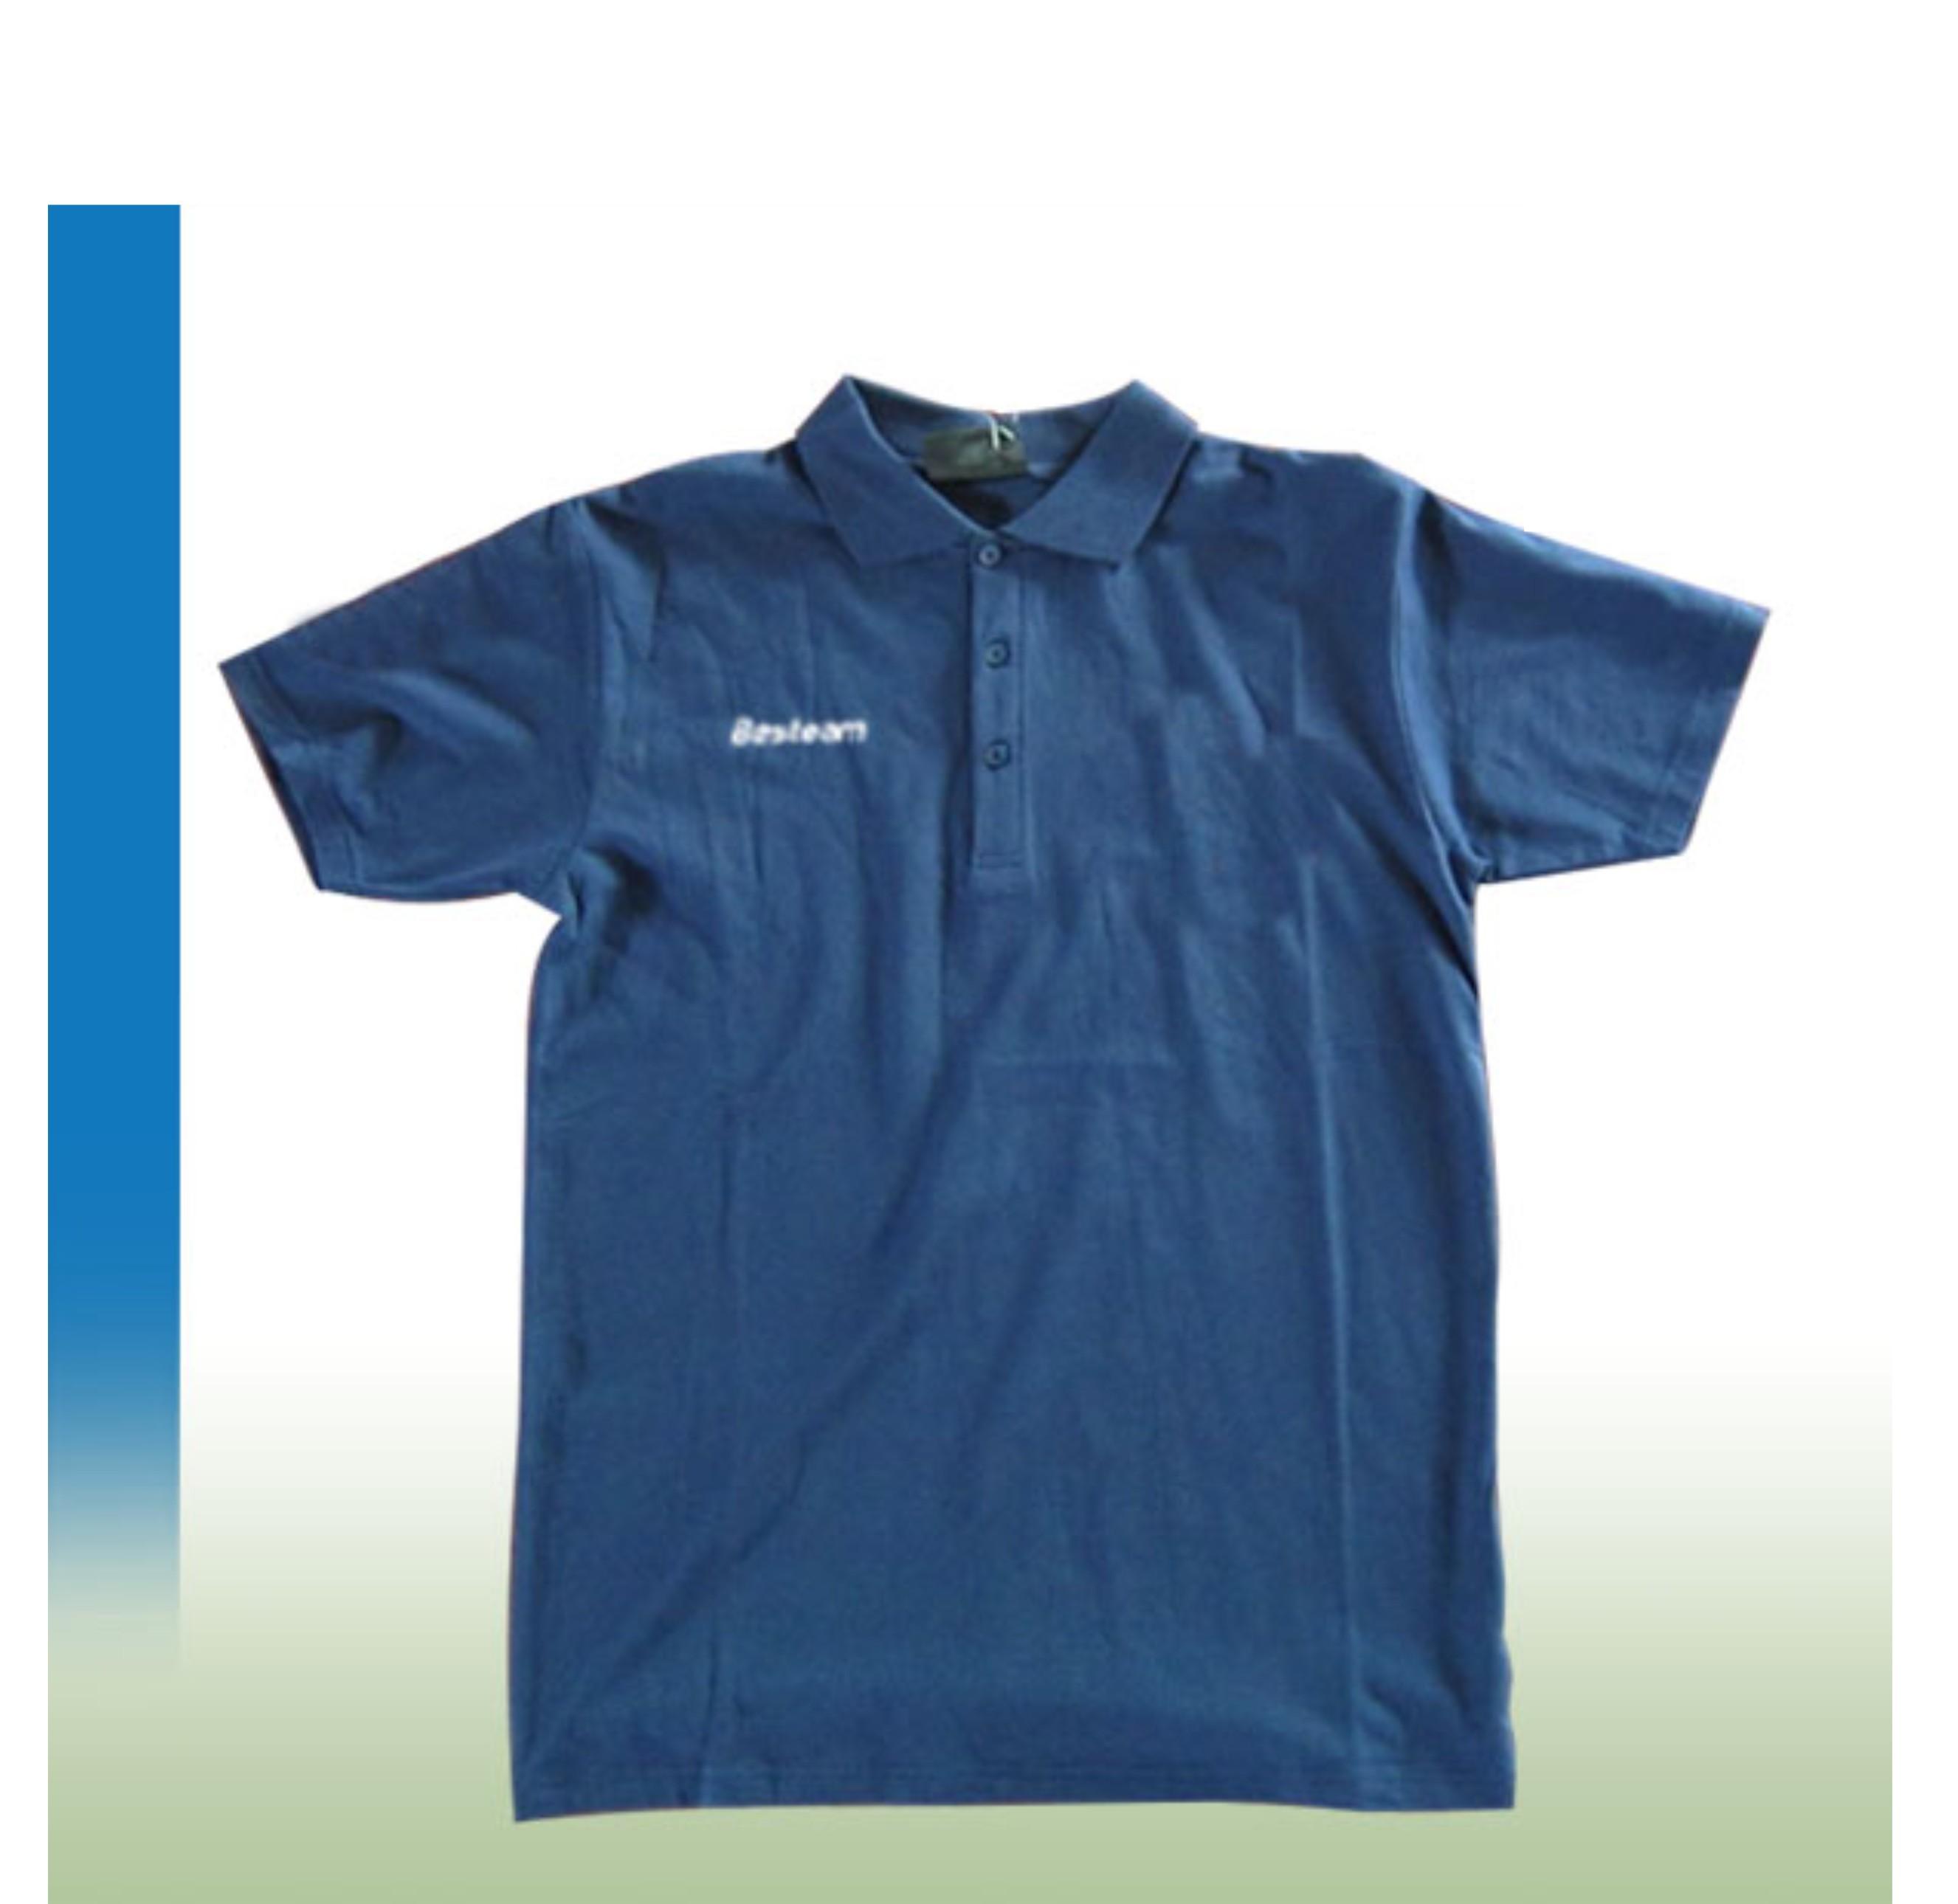 Custom dry fit embroidery polo shirt sport golf shirt